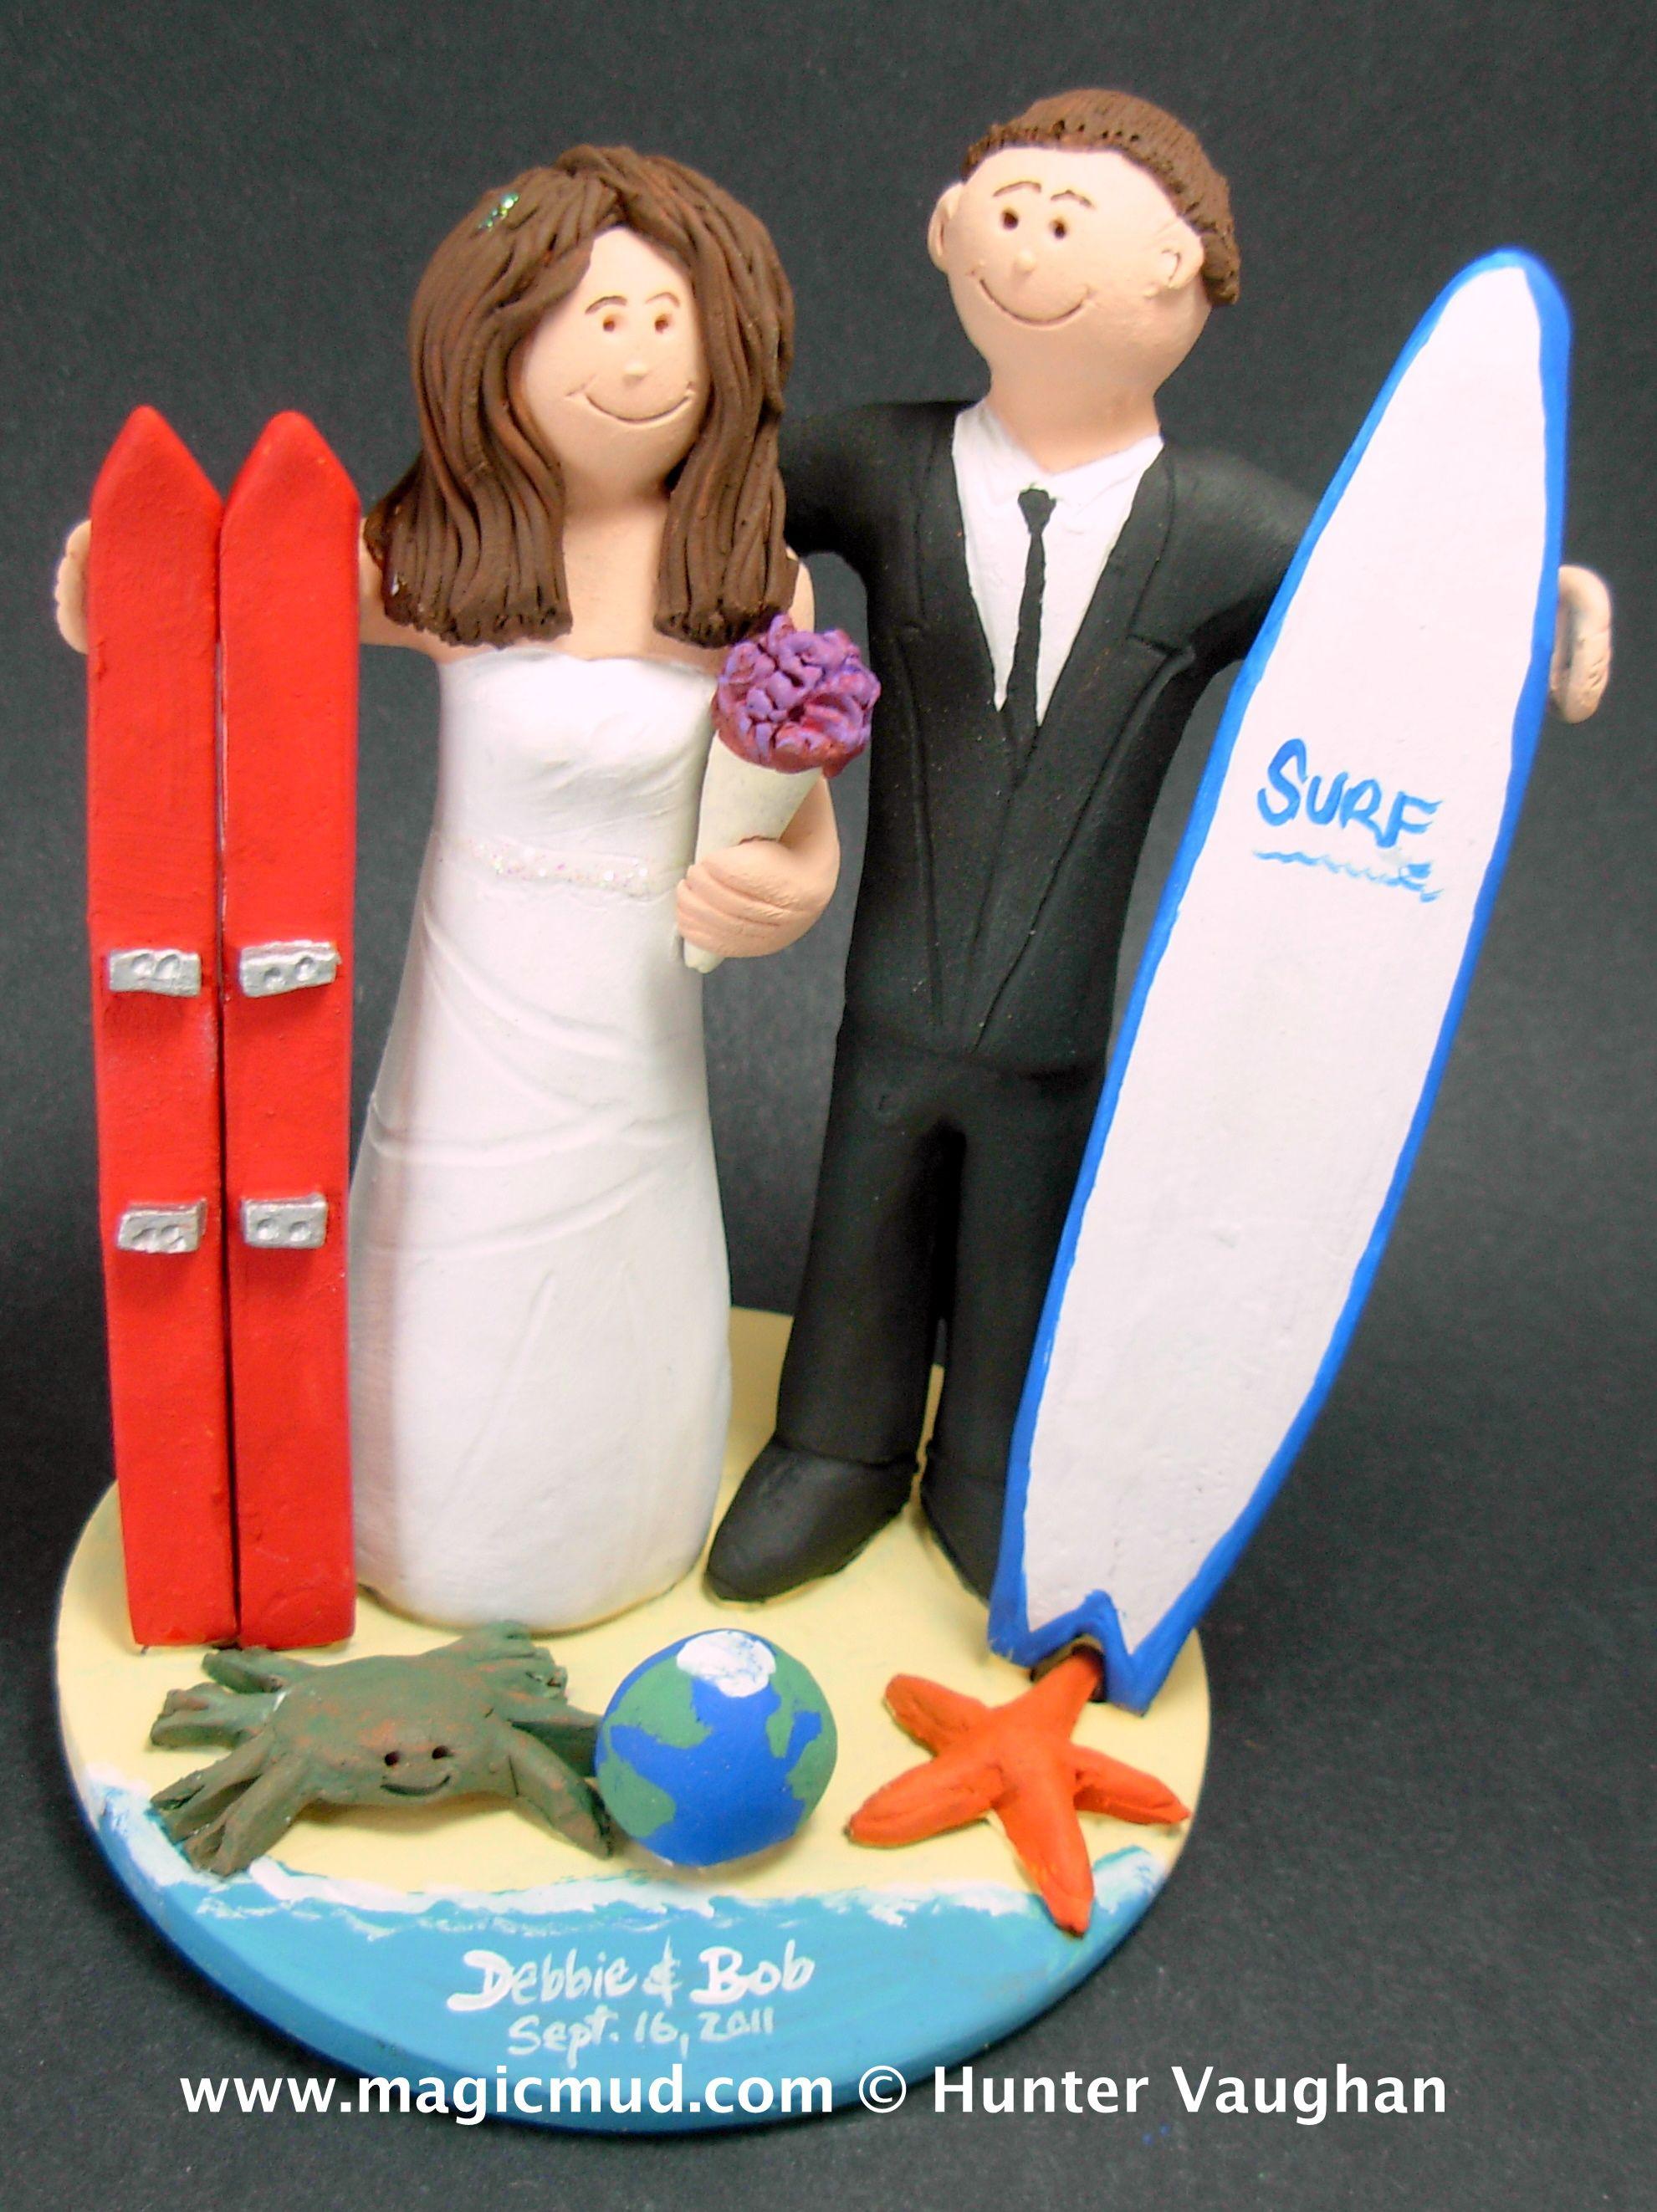 Surfer marries skiier wedding cake topper gicmud